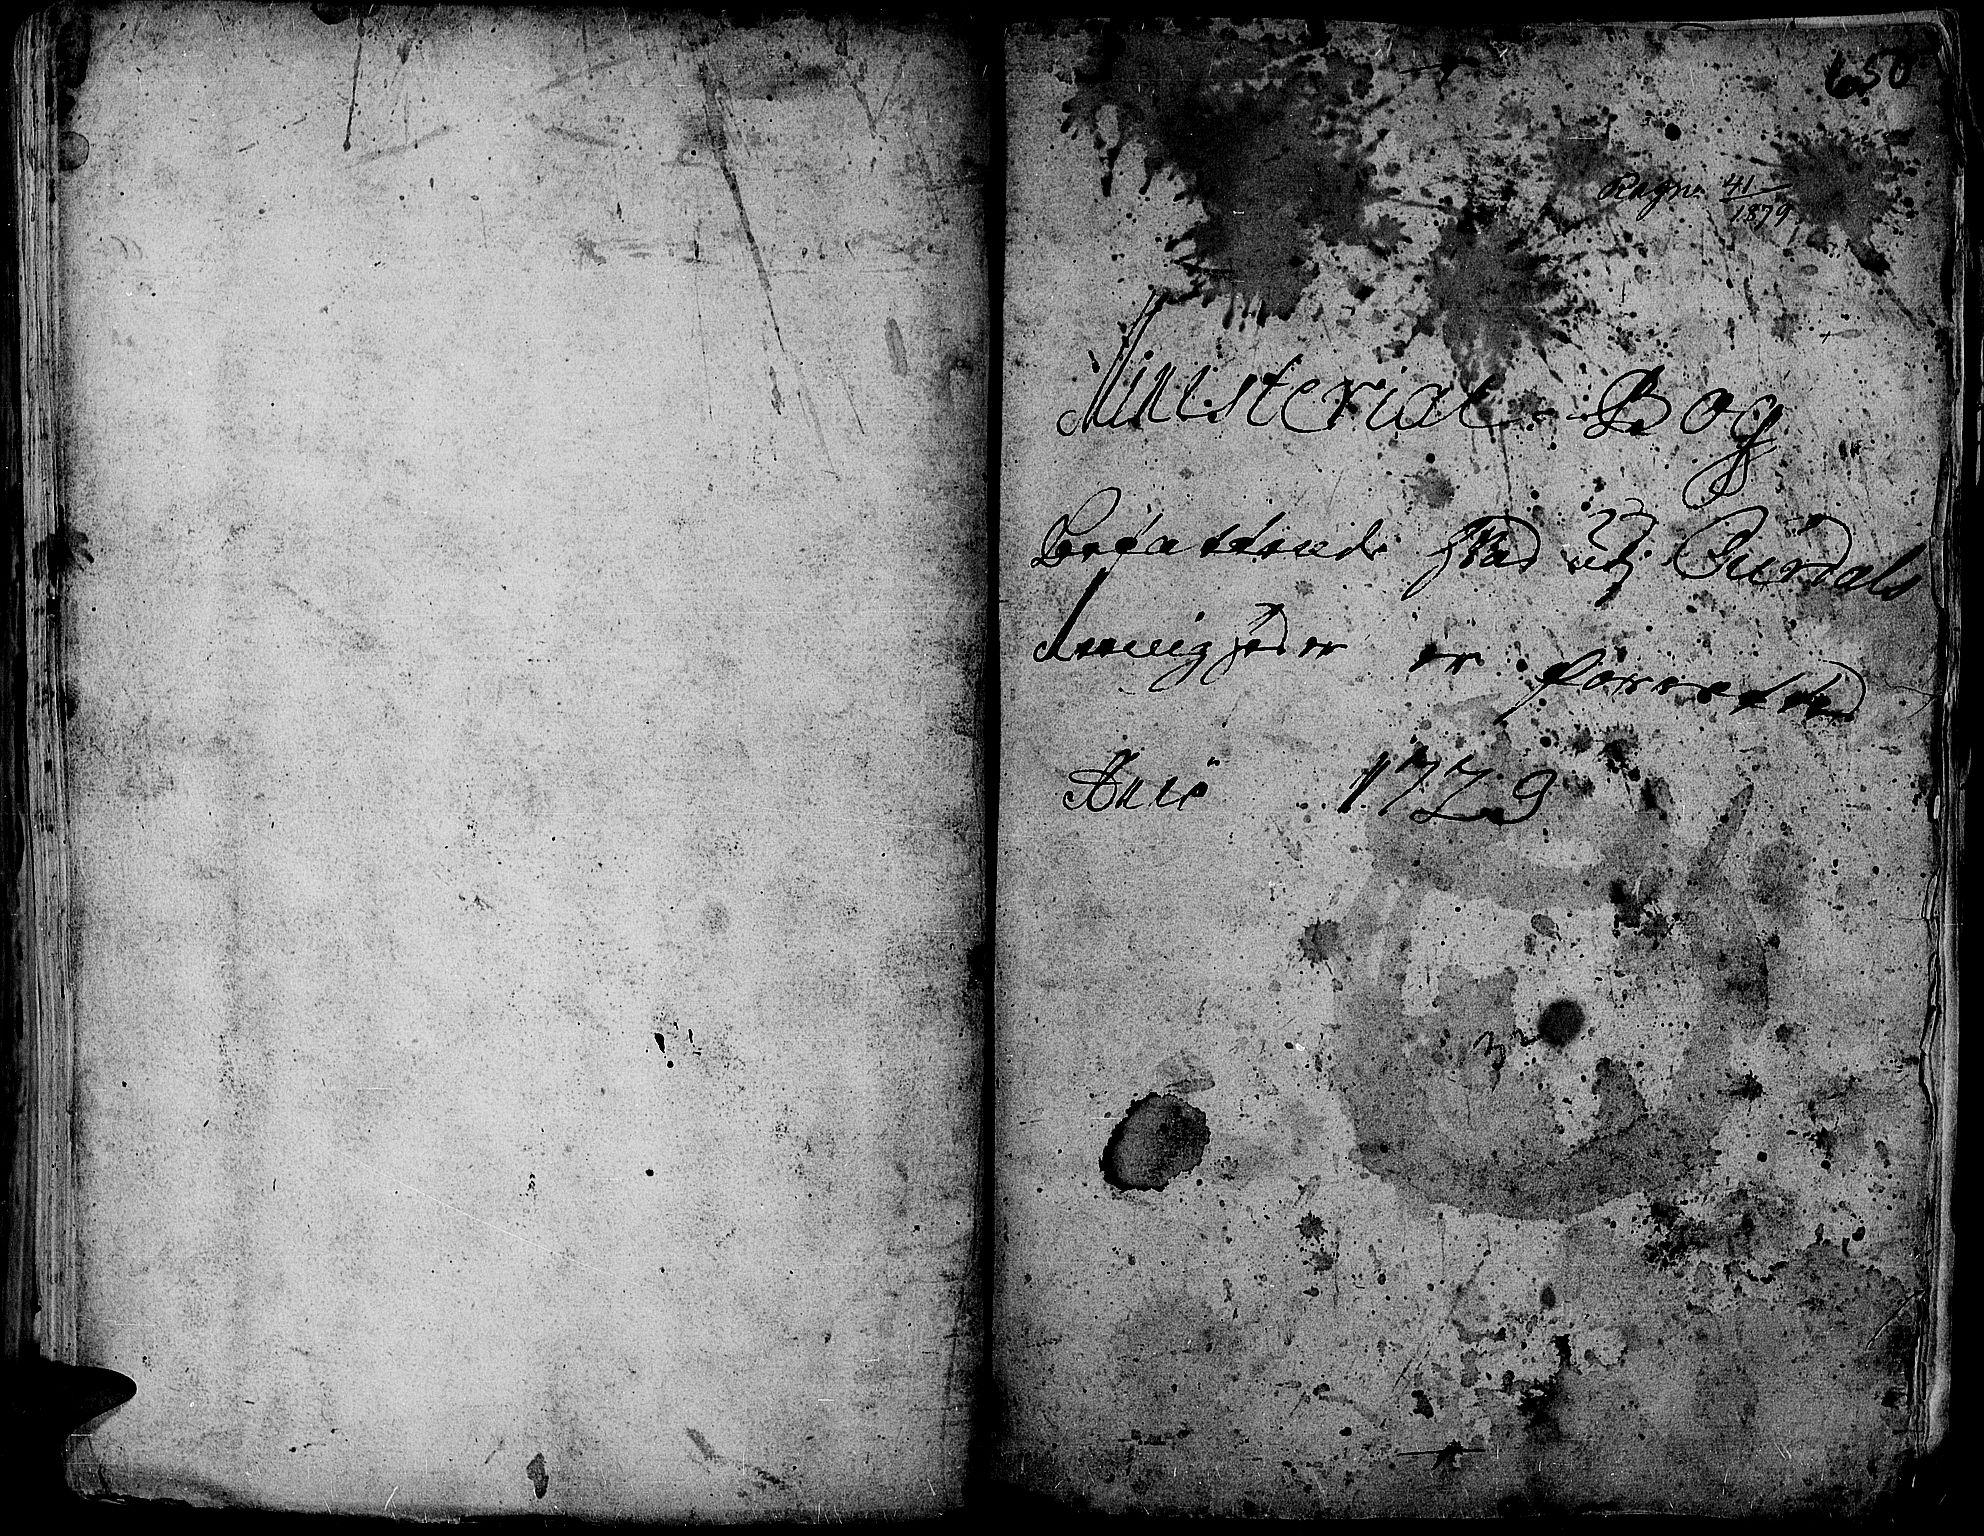 SAH, Aurdal prestekontor, Ministerialbok nr. 1-3, 1692-1730, s. 650